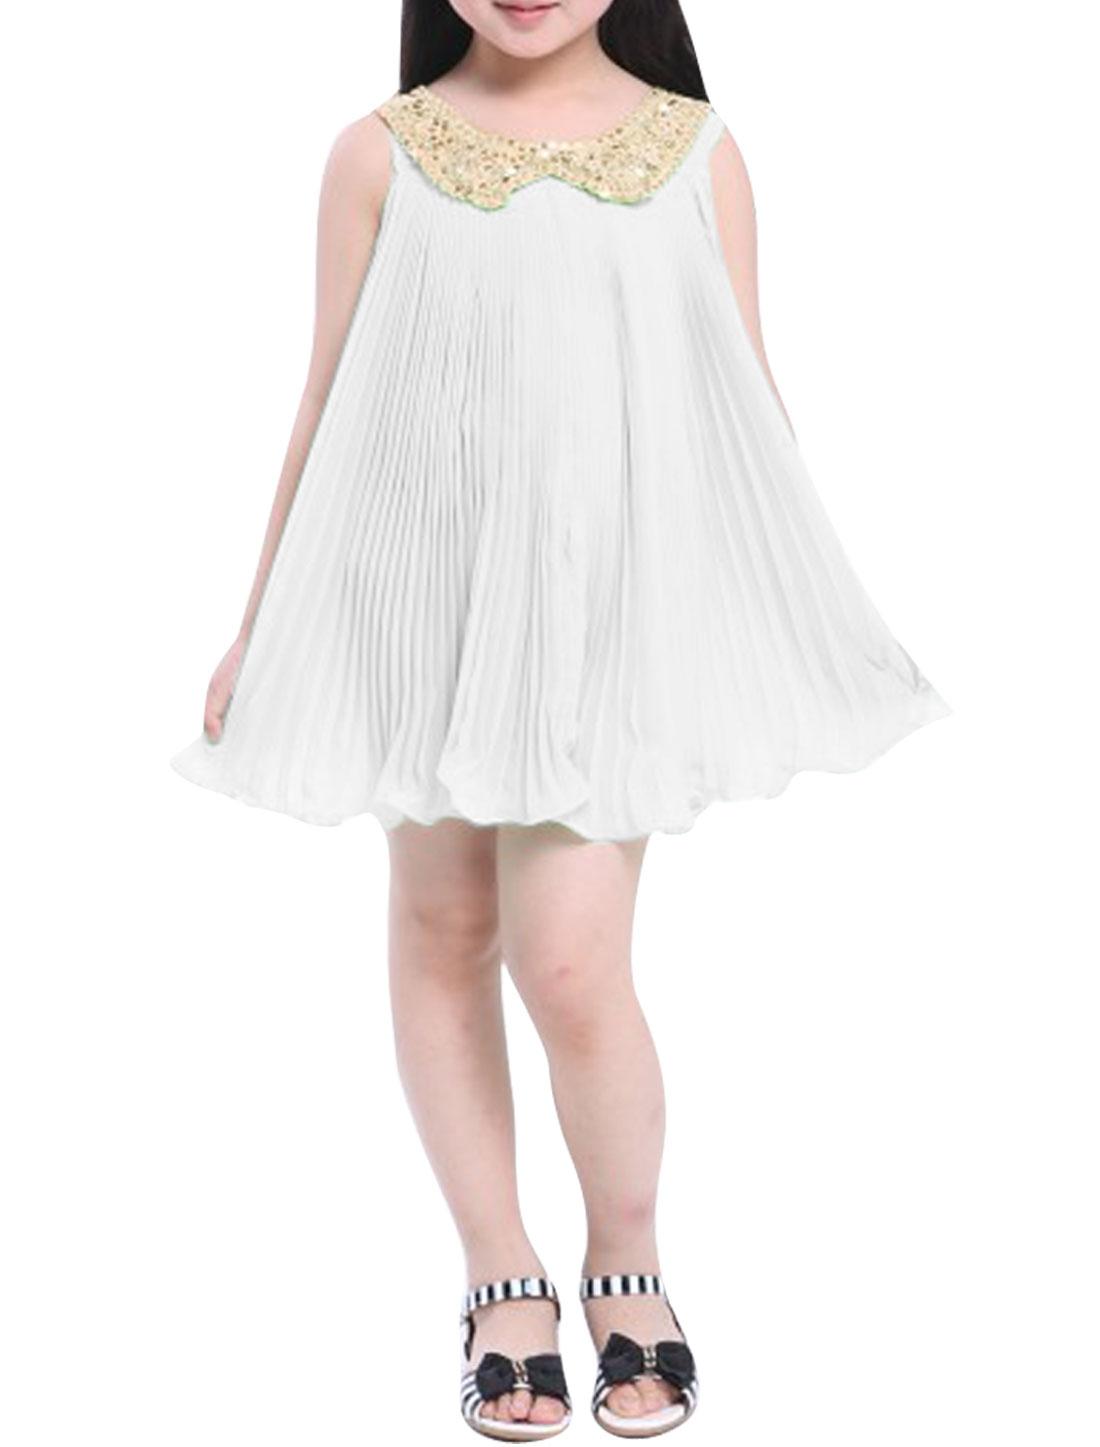 Girl Ruffled Hem White Color Pleated Babydoll Dress 7